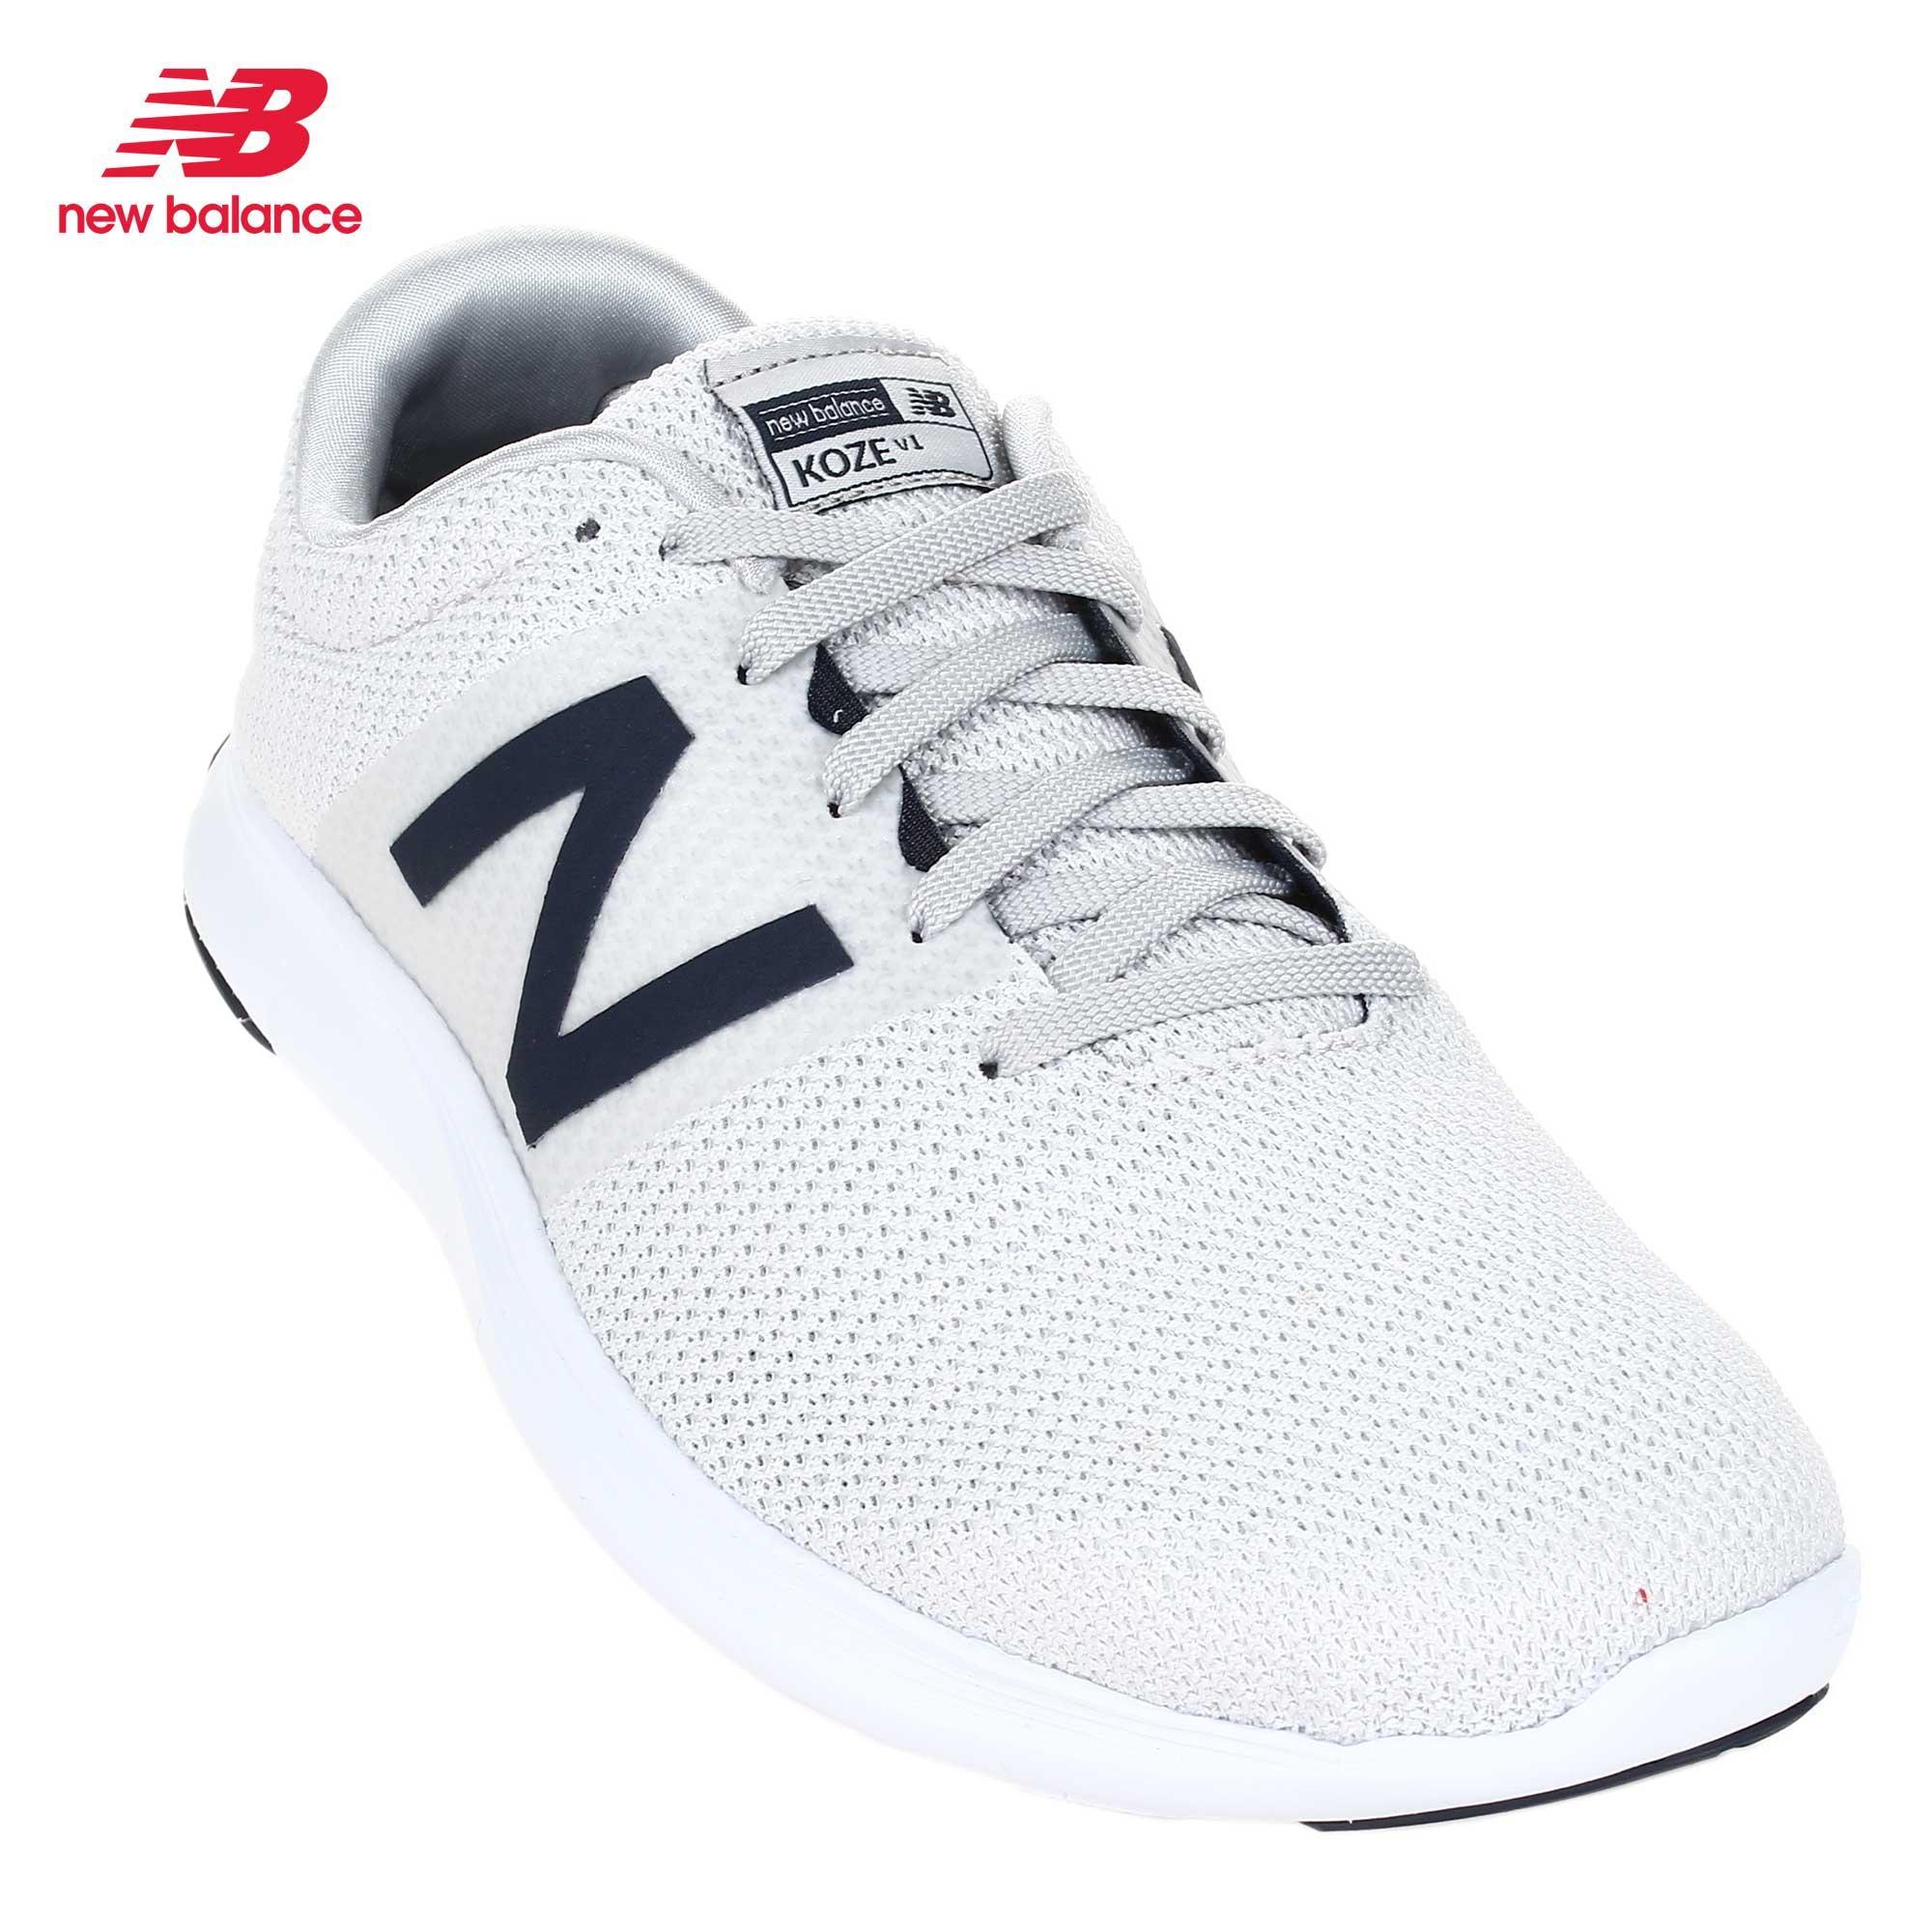 new balance running shoes lazada, OFF